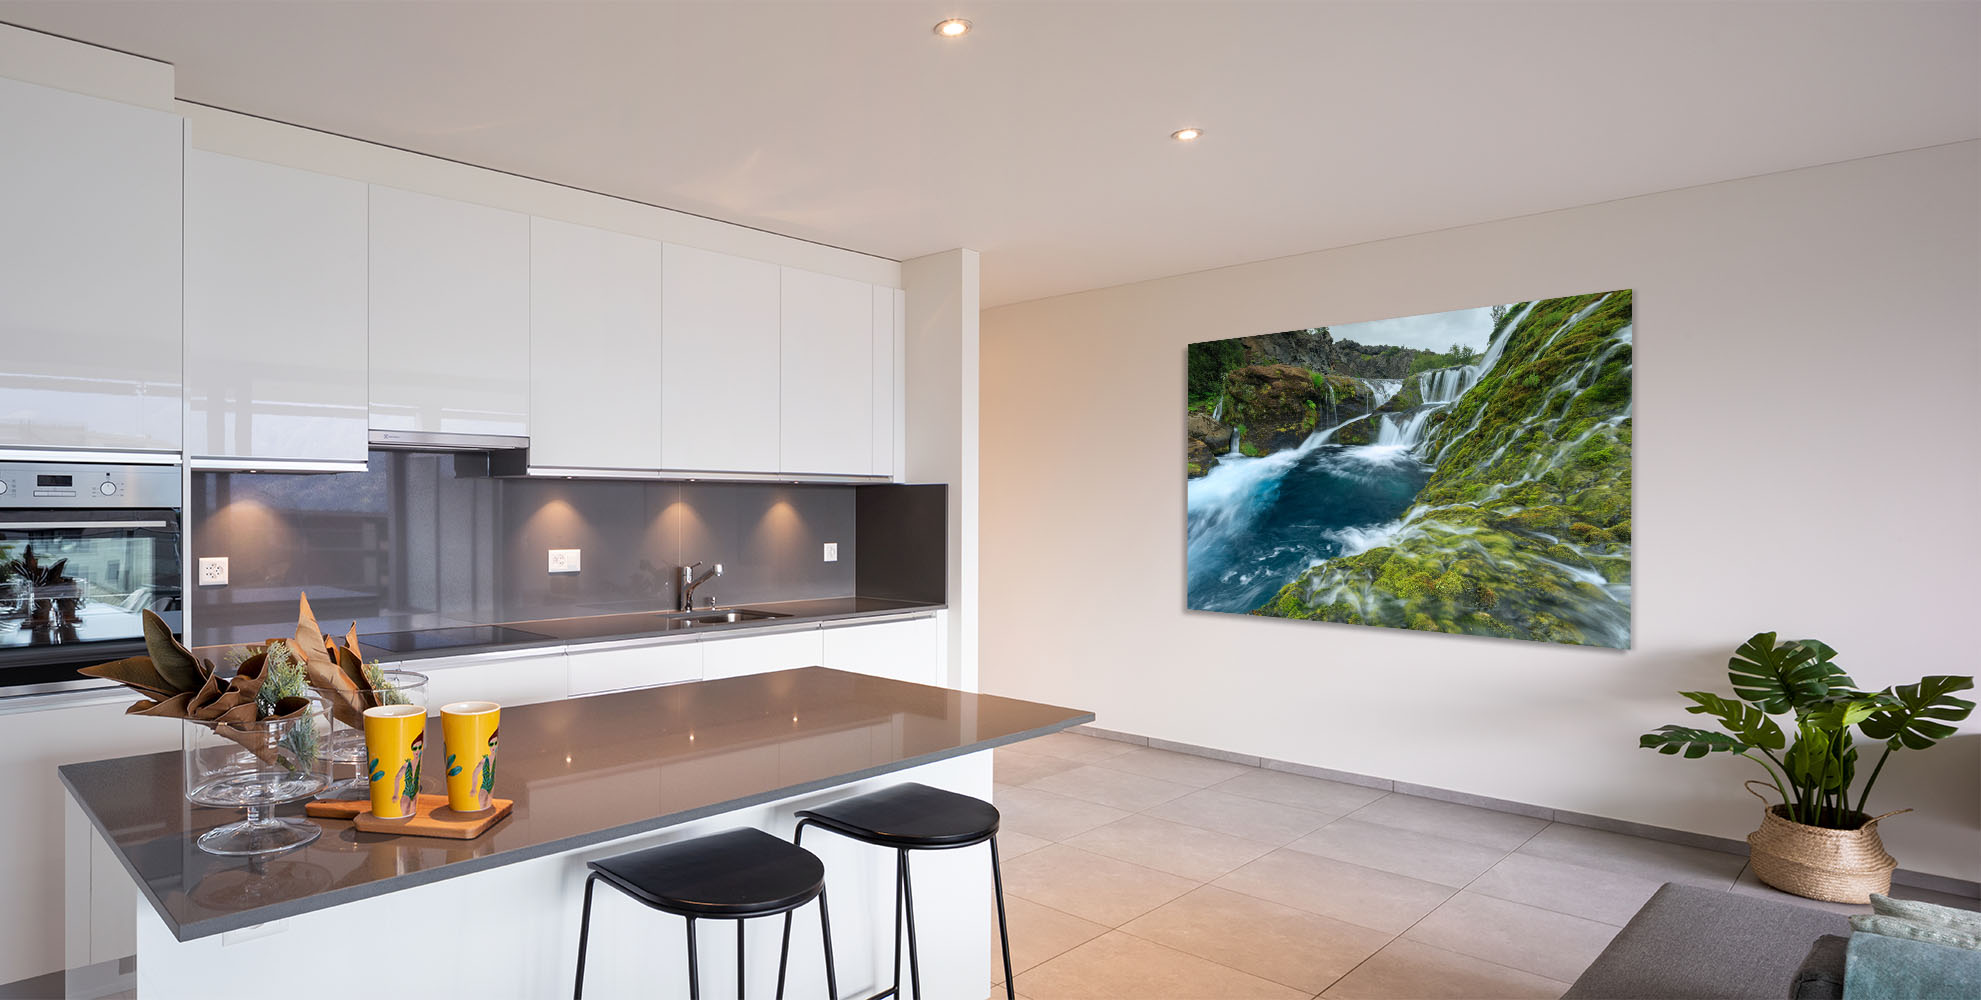 Iceland Fine Art Waterfall Oasis Luxury Home Decor Kitchen Artwork Michael Andrejkow